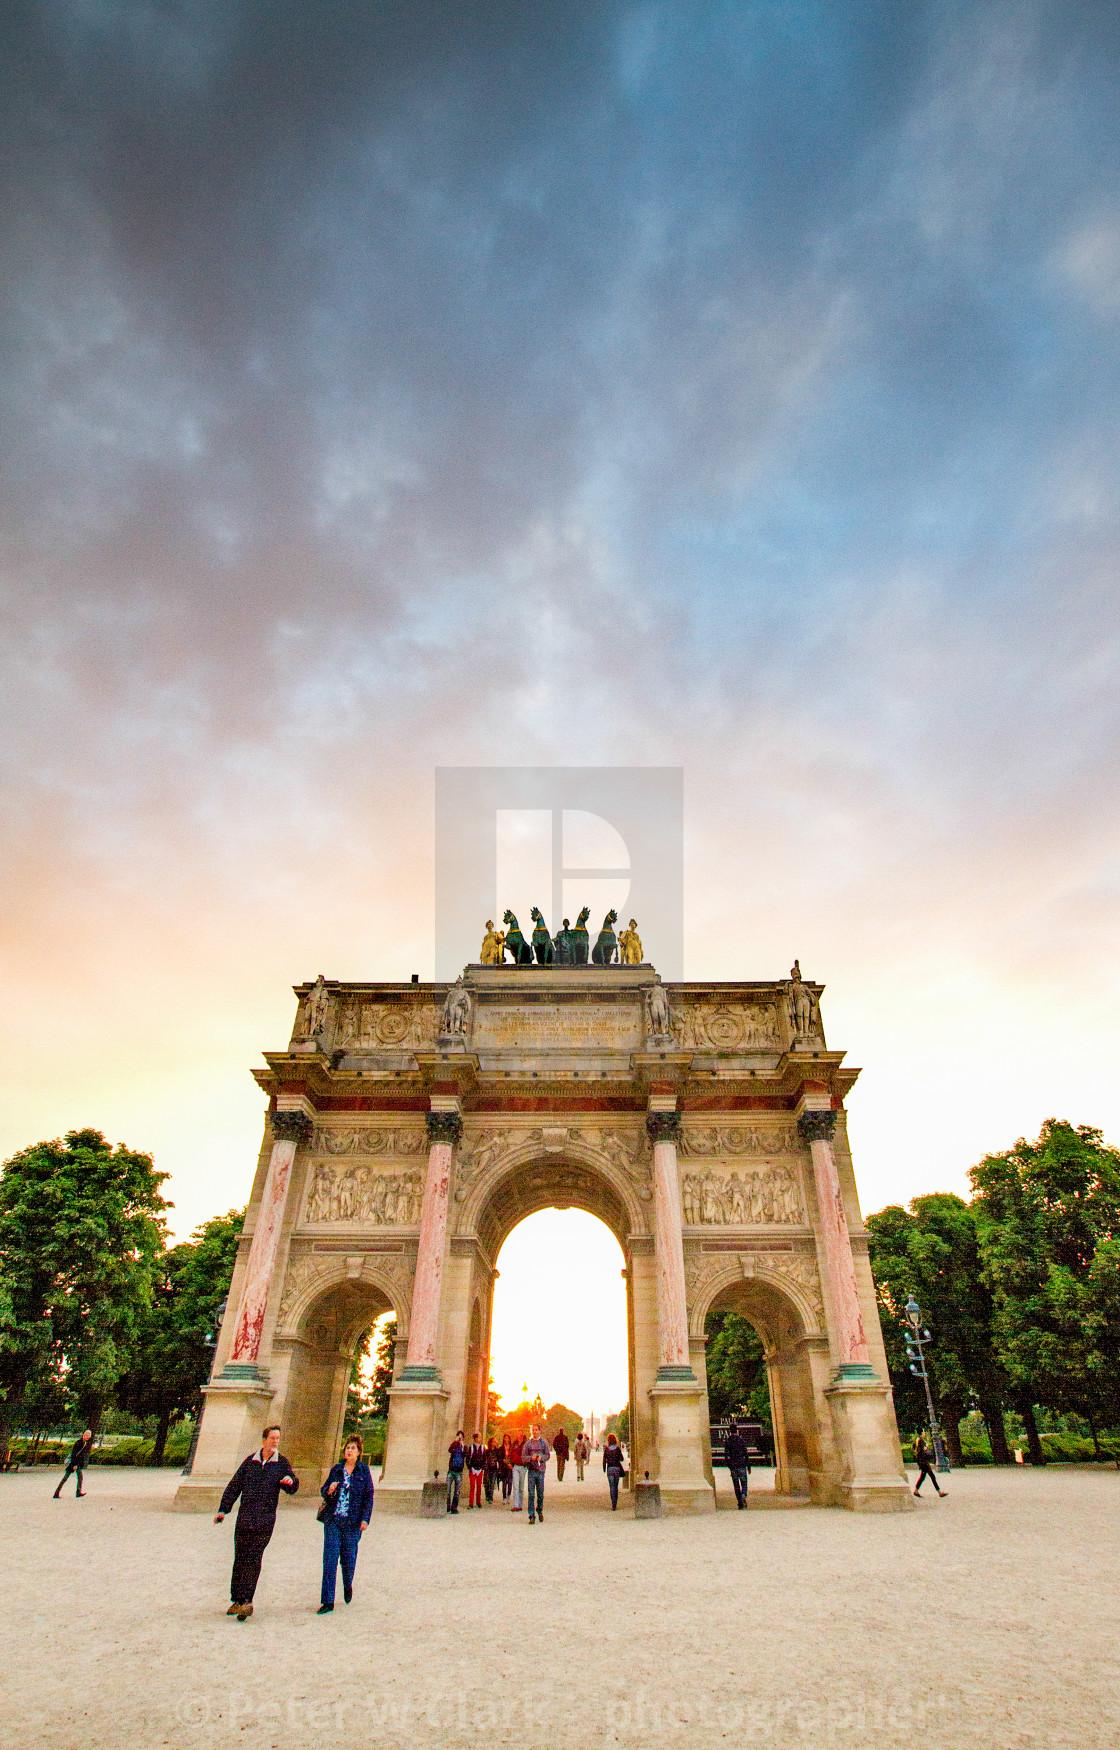 """The Arc de Triomphe du Carrousel in Paris. Tuileries Garden in the background"" stock image"